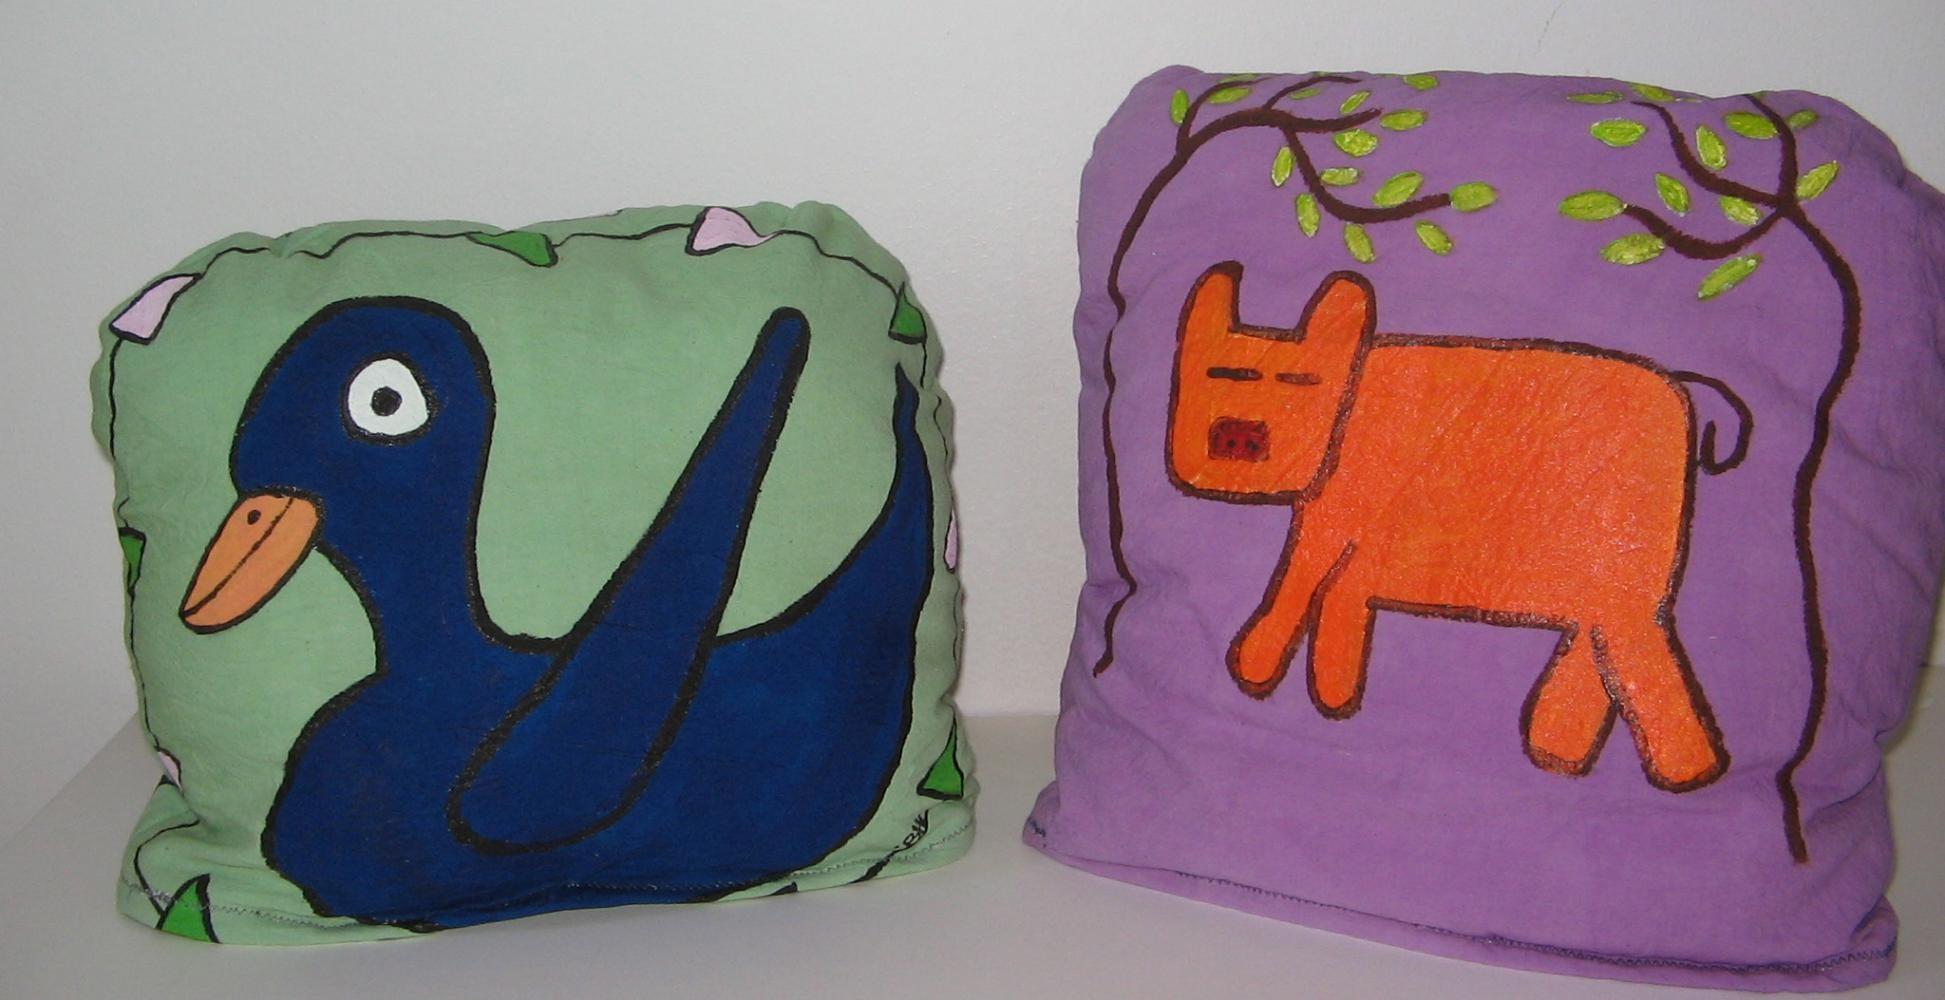 aCrylic based Textile paints on Cotton, 2012,